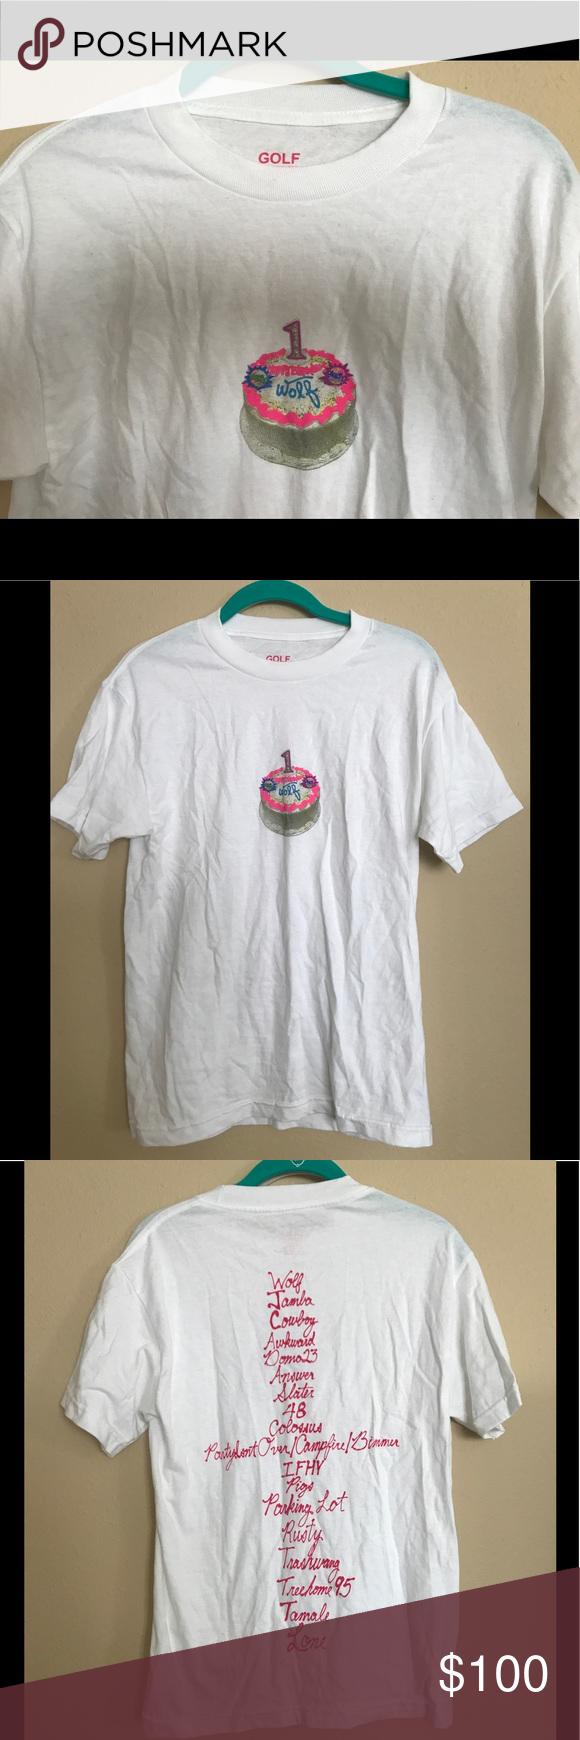 4334af3e2163 RARE Tyler The Creator  Wolf  1st Birthday T-Shirt NEVER WORN Tyler The  Creator   Odd Future   Golf Wang rare t-shirt. Golf Wang Shirts Tees -  Short Sleeve